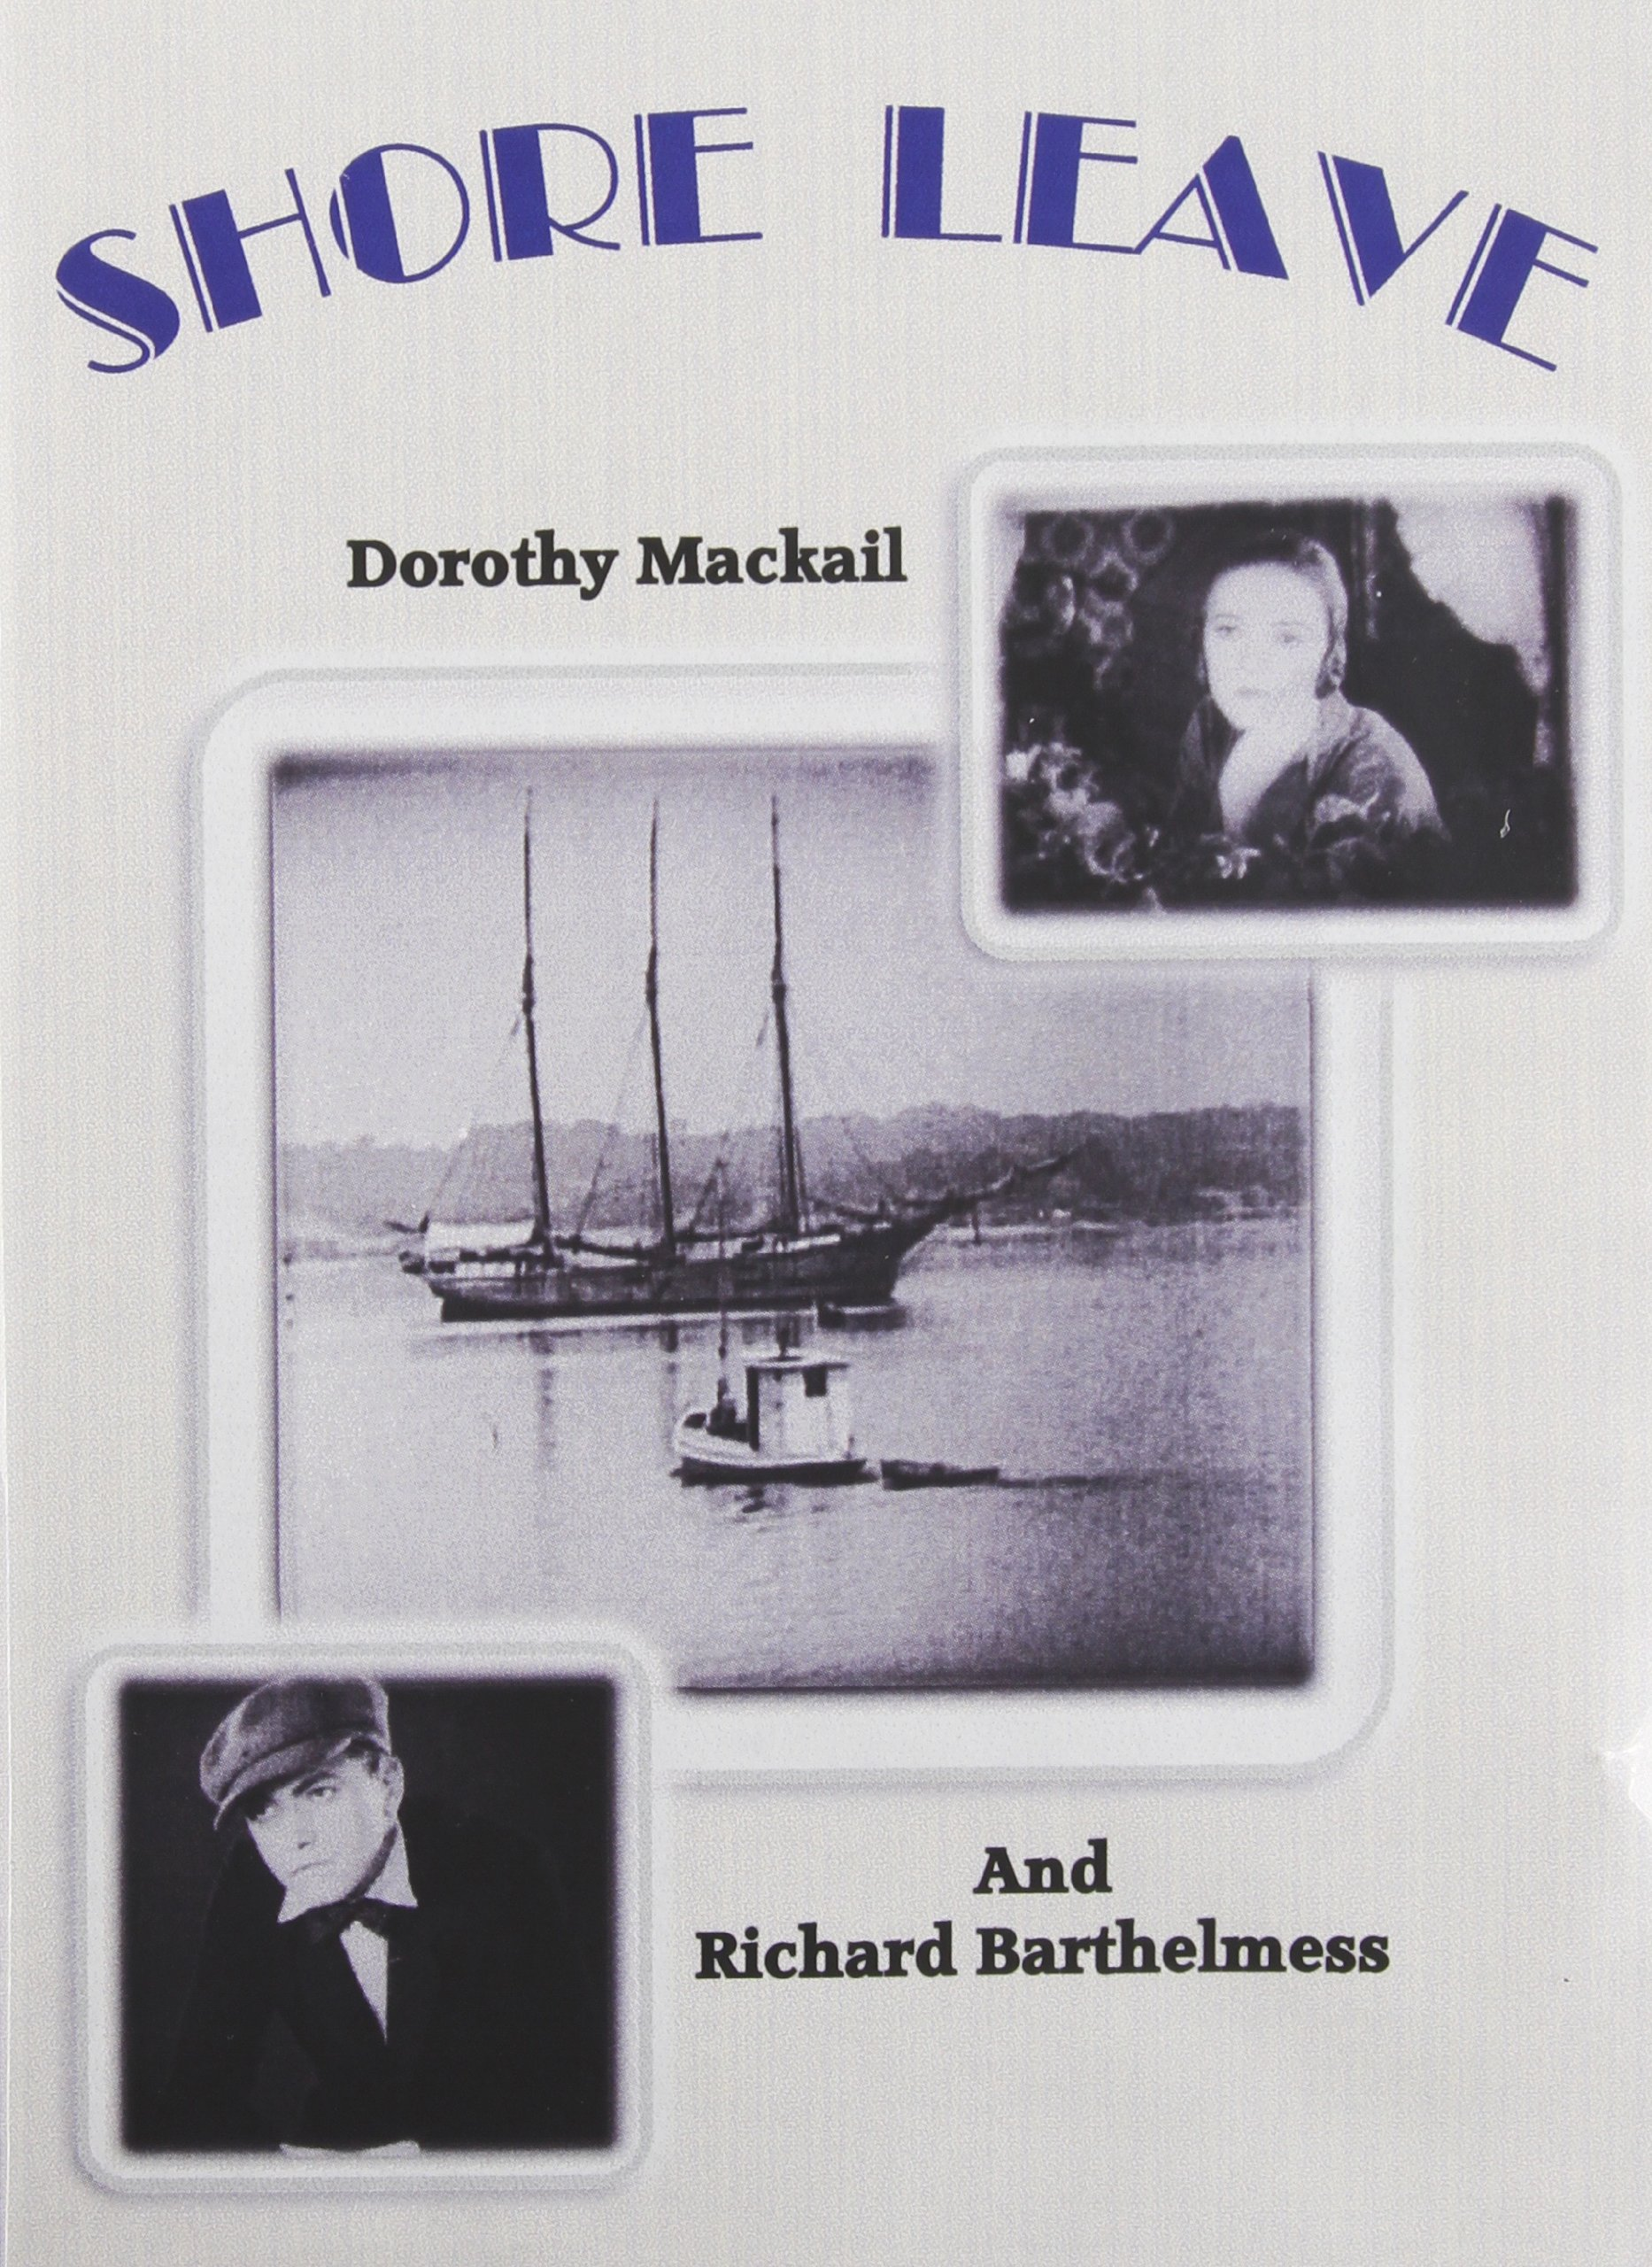 DVD : Shore Leave (Black & White, Silent Movie)